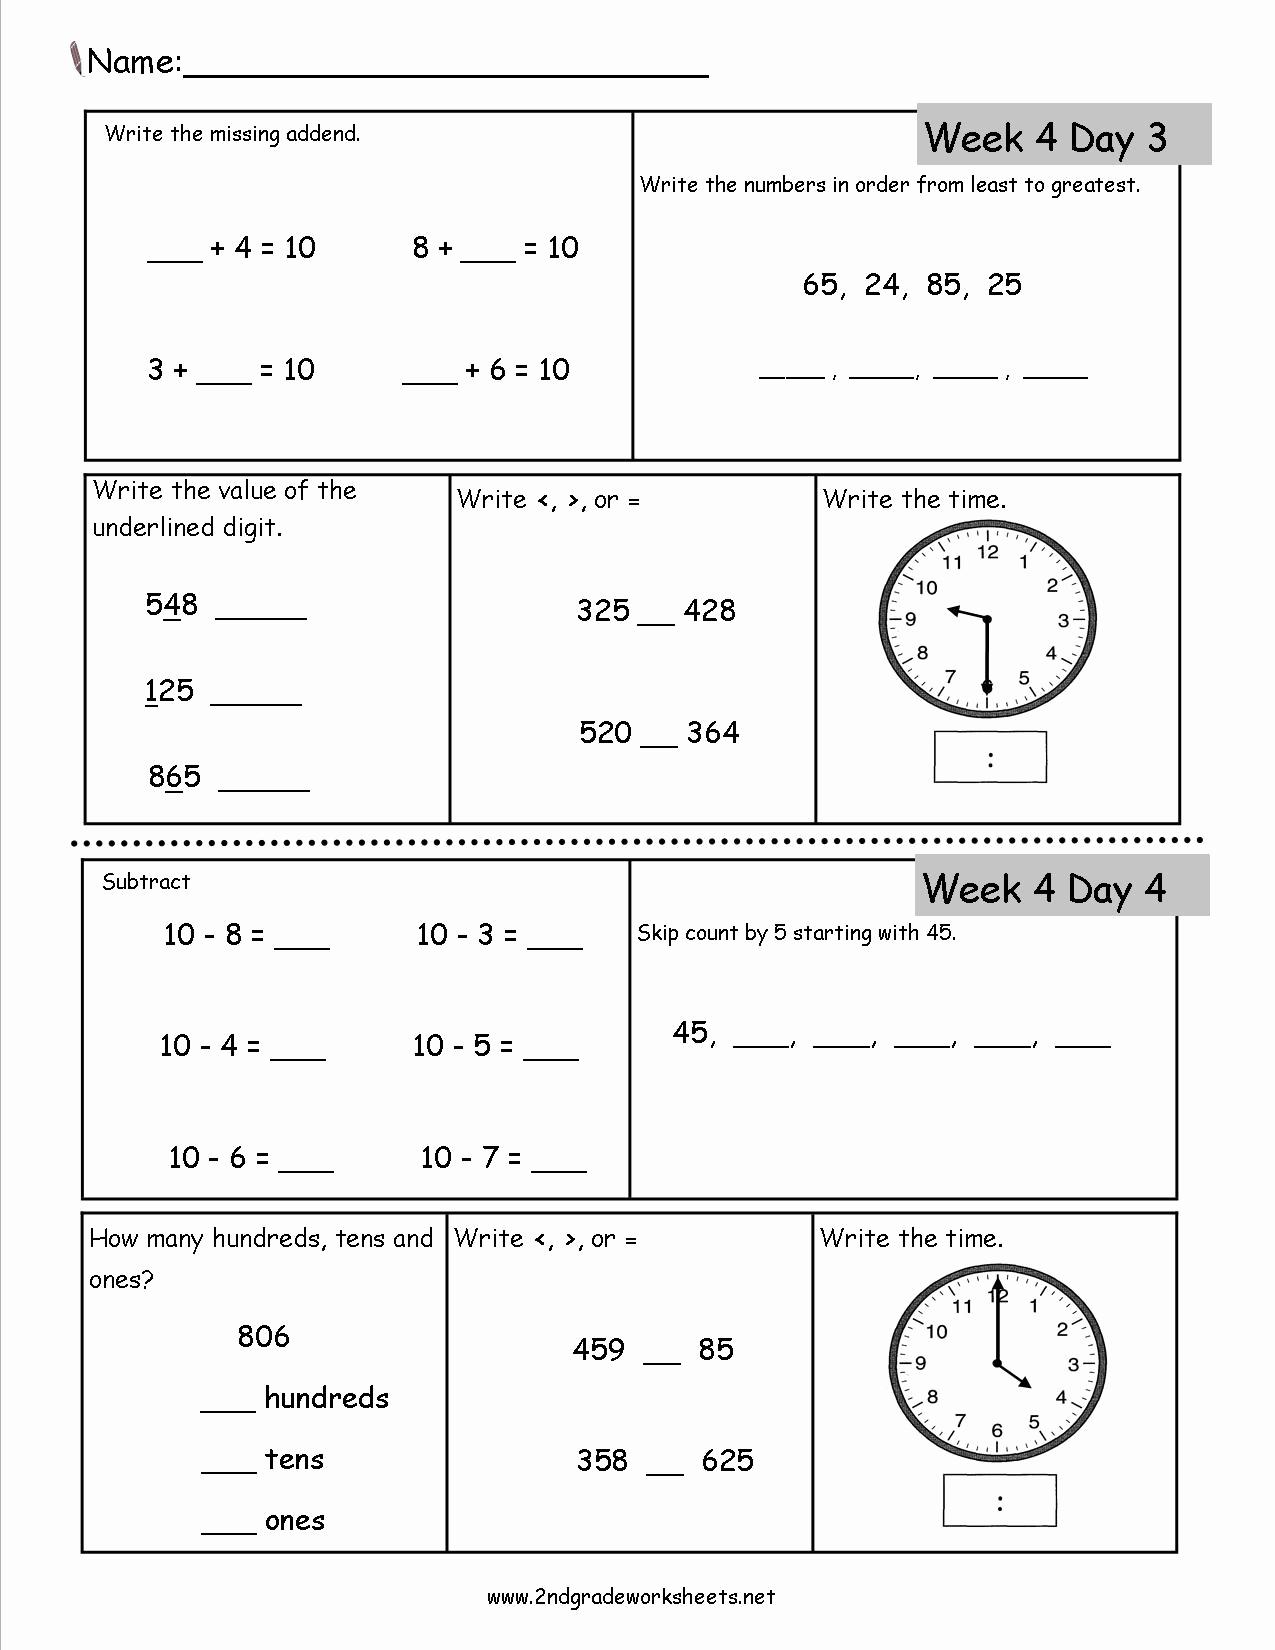 Summary Worksheets 2nd Grade New Free 2nd Grade Daily Math Worksheets